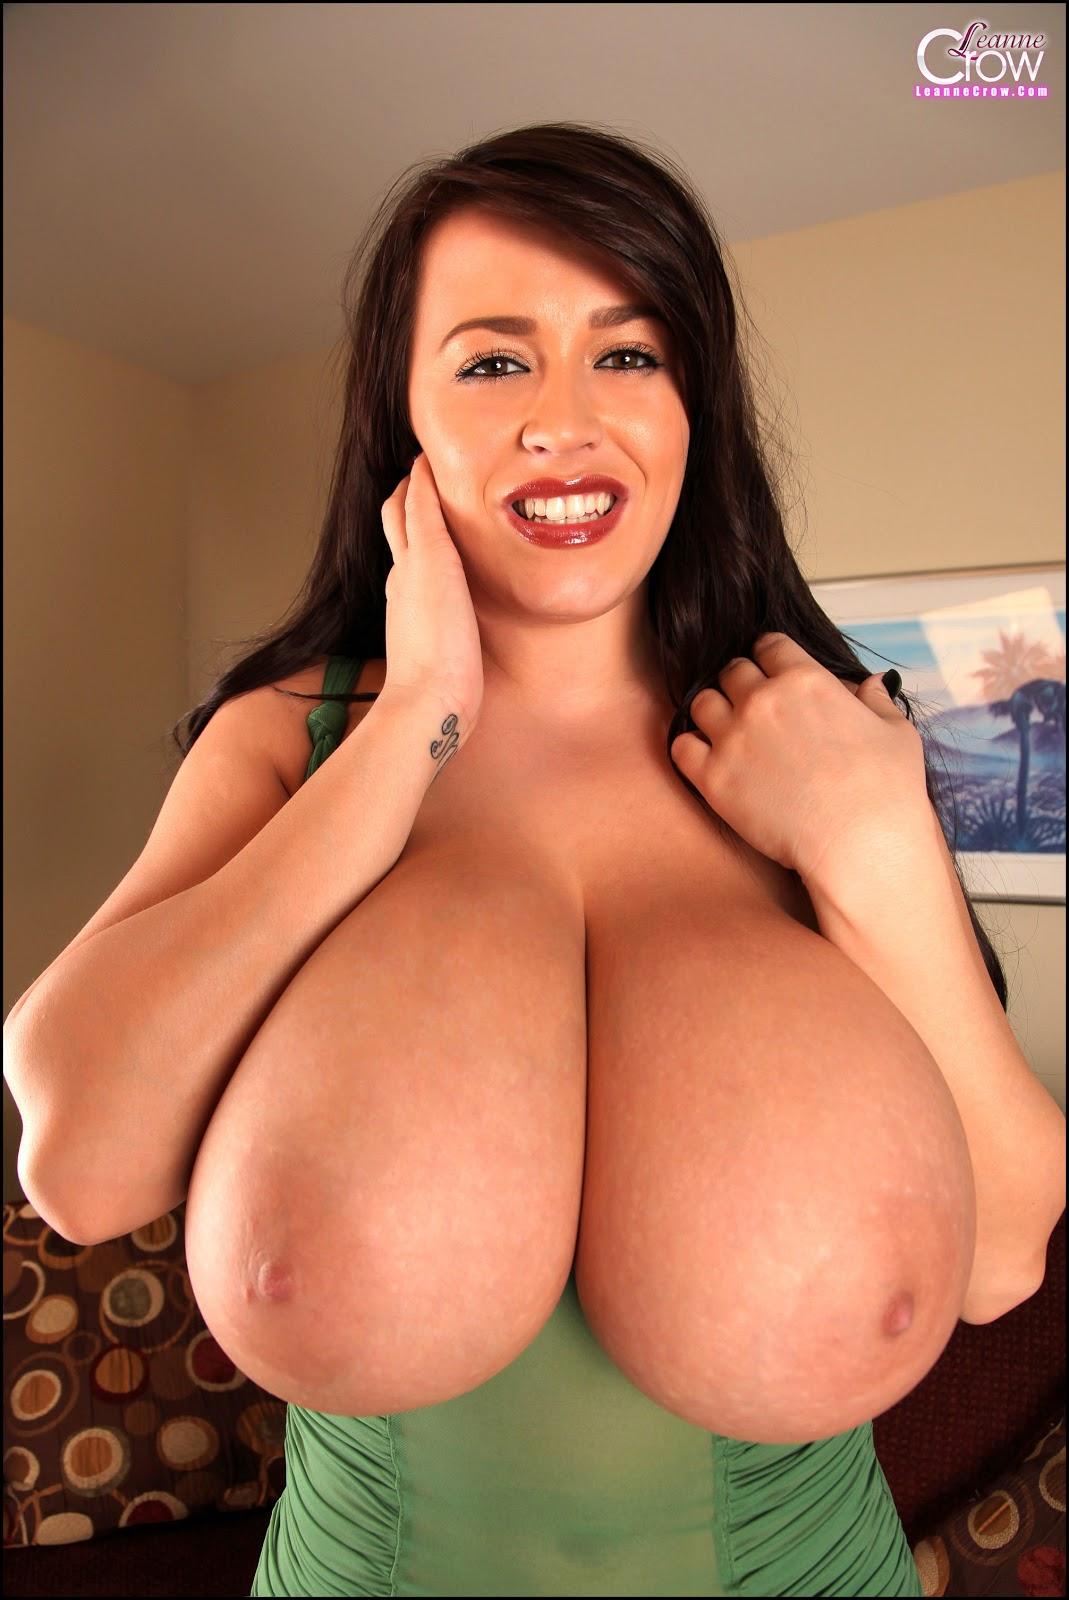 Nurse women big breast porn pictures porn movie